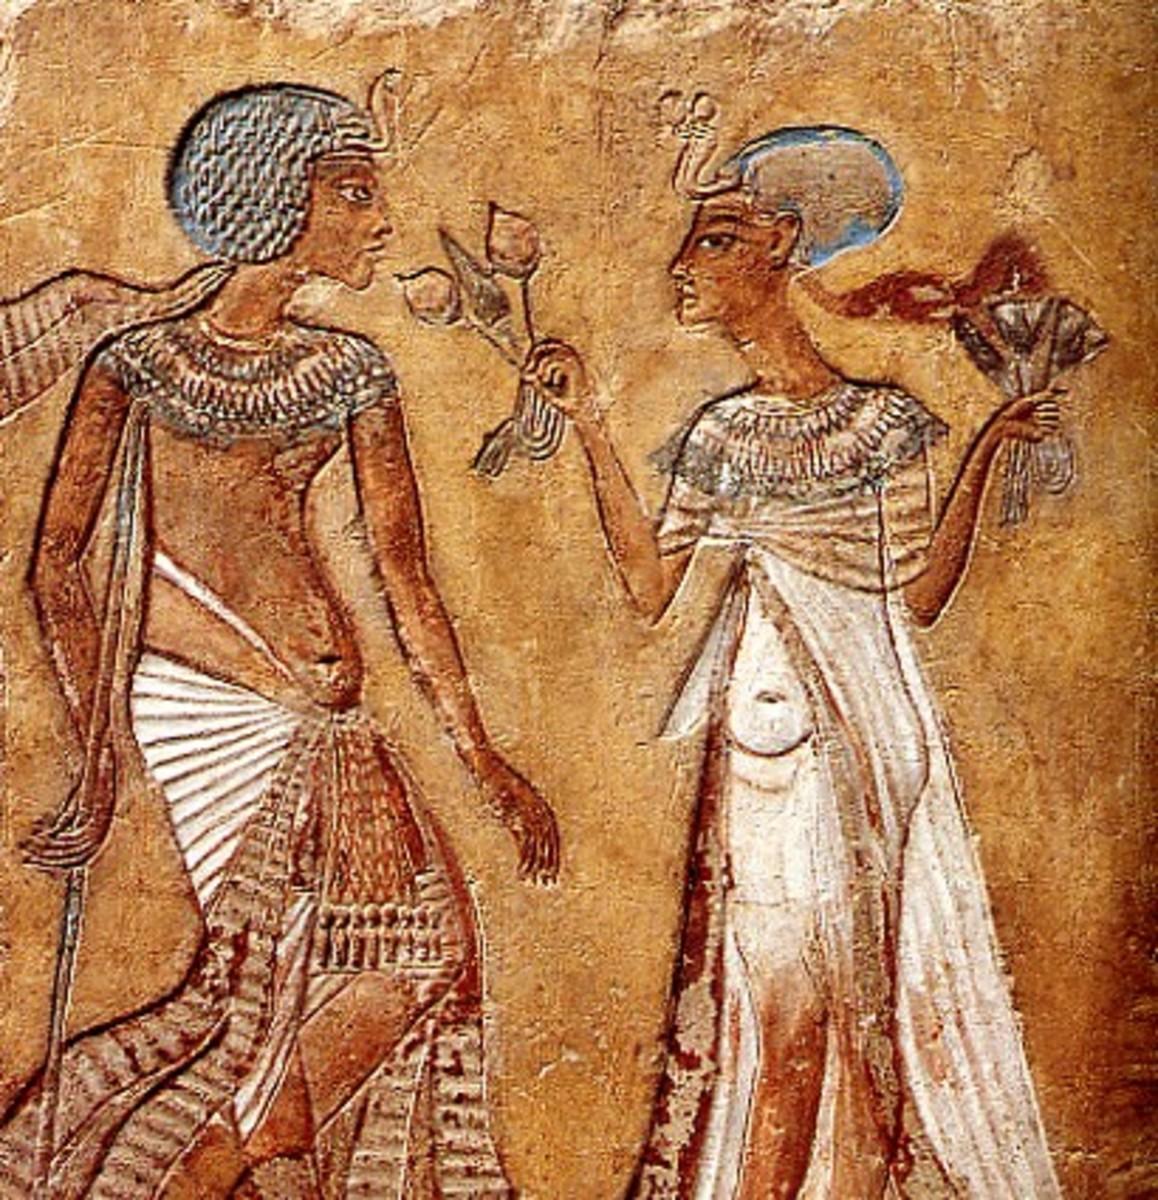 King Smenkhkare and Queen Merytaten